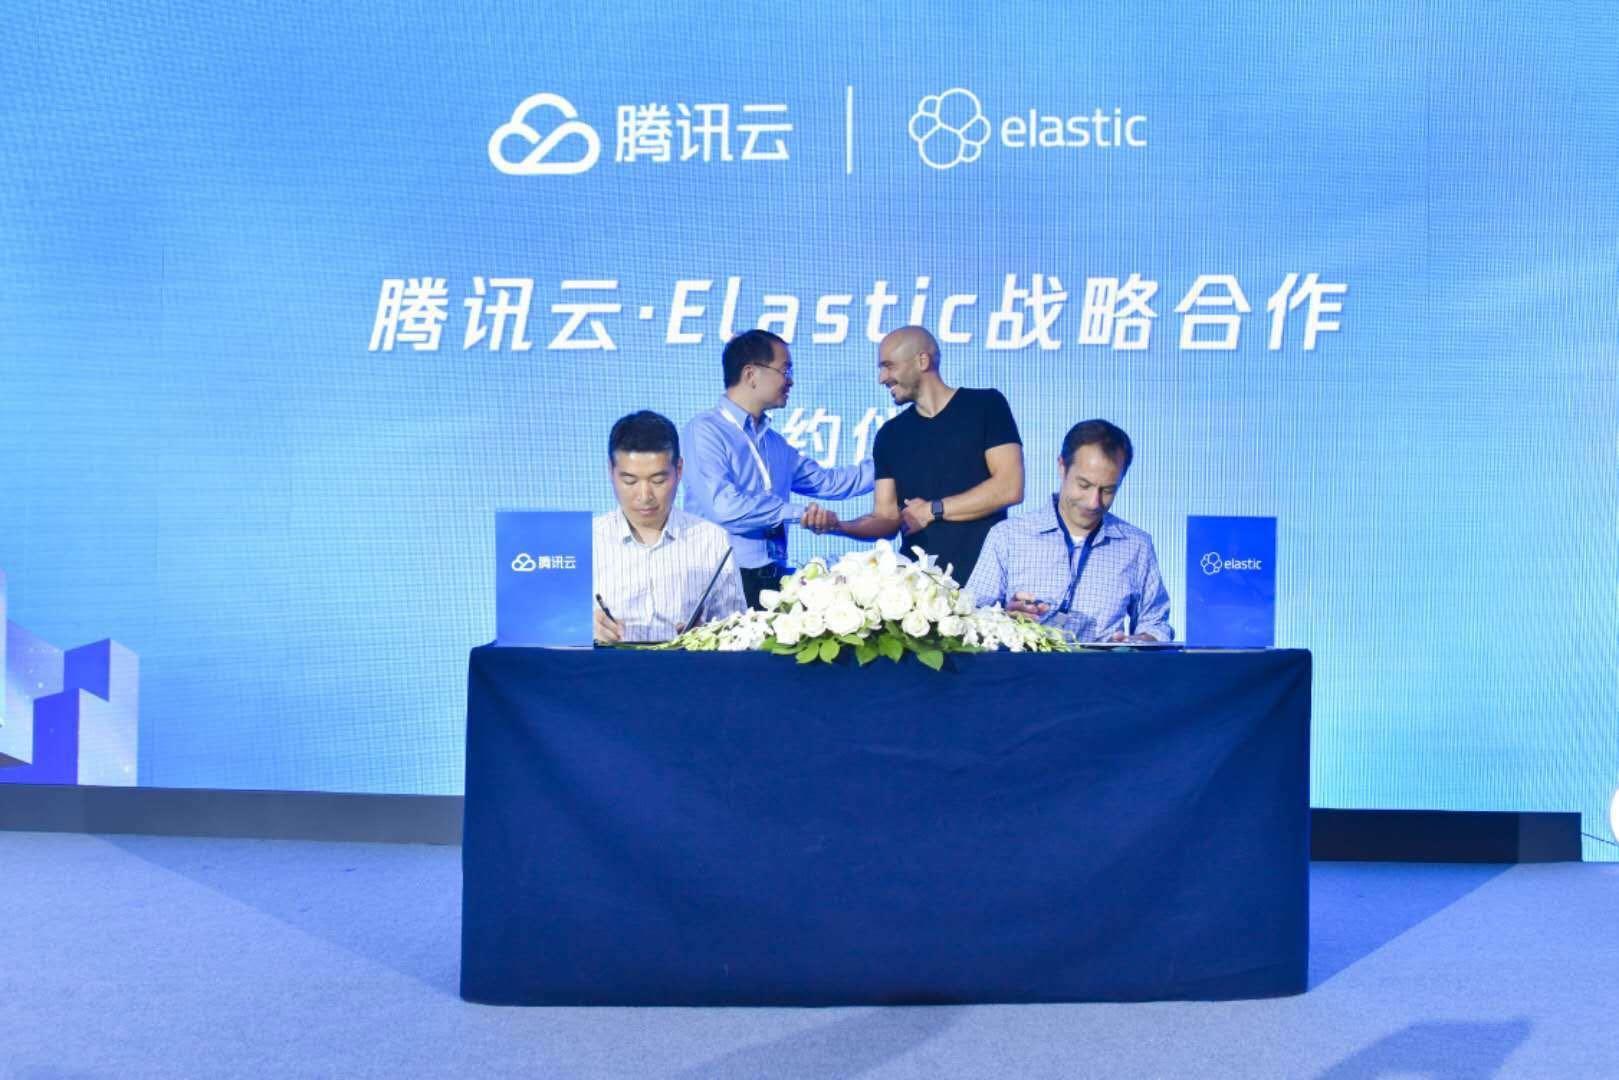 Tencent Cloud Elasticsearch Service